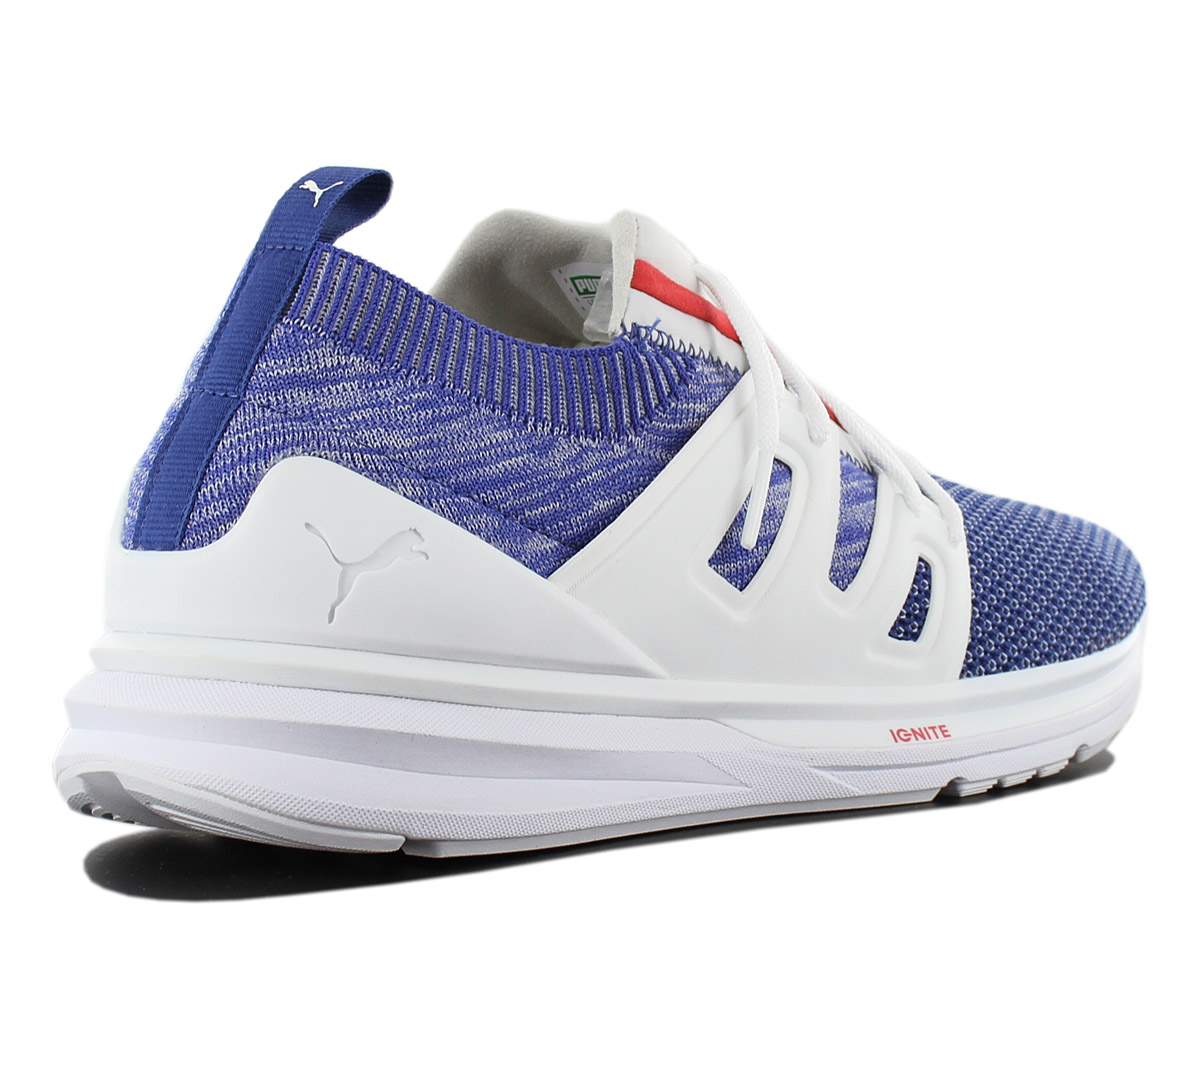 Puma Blaze of Glory B O.G Limitless Evoknit Men s Sneakers 363669-04 ... 5ac29611057